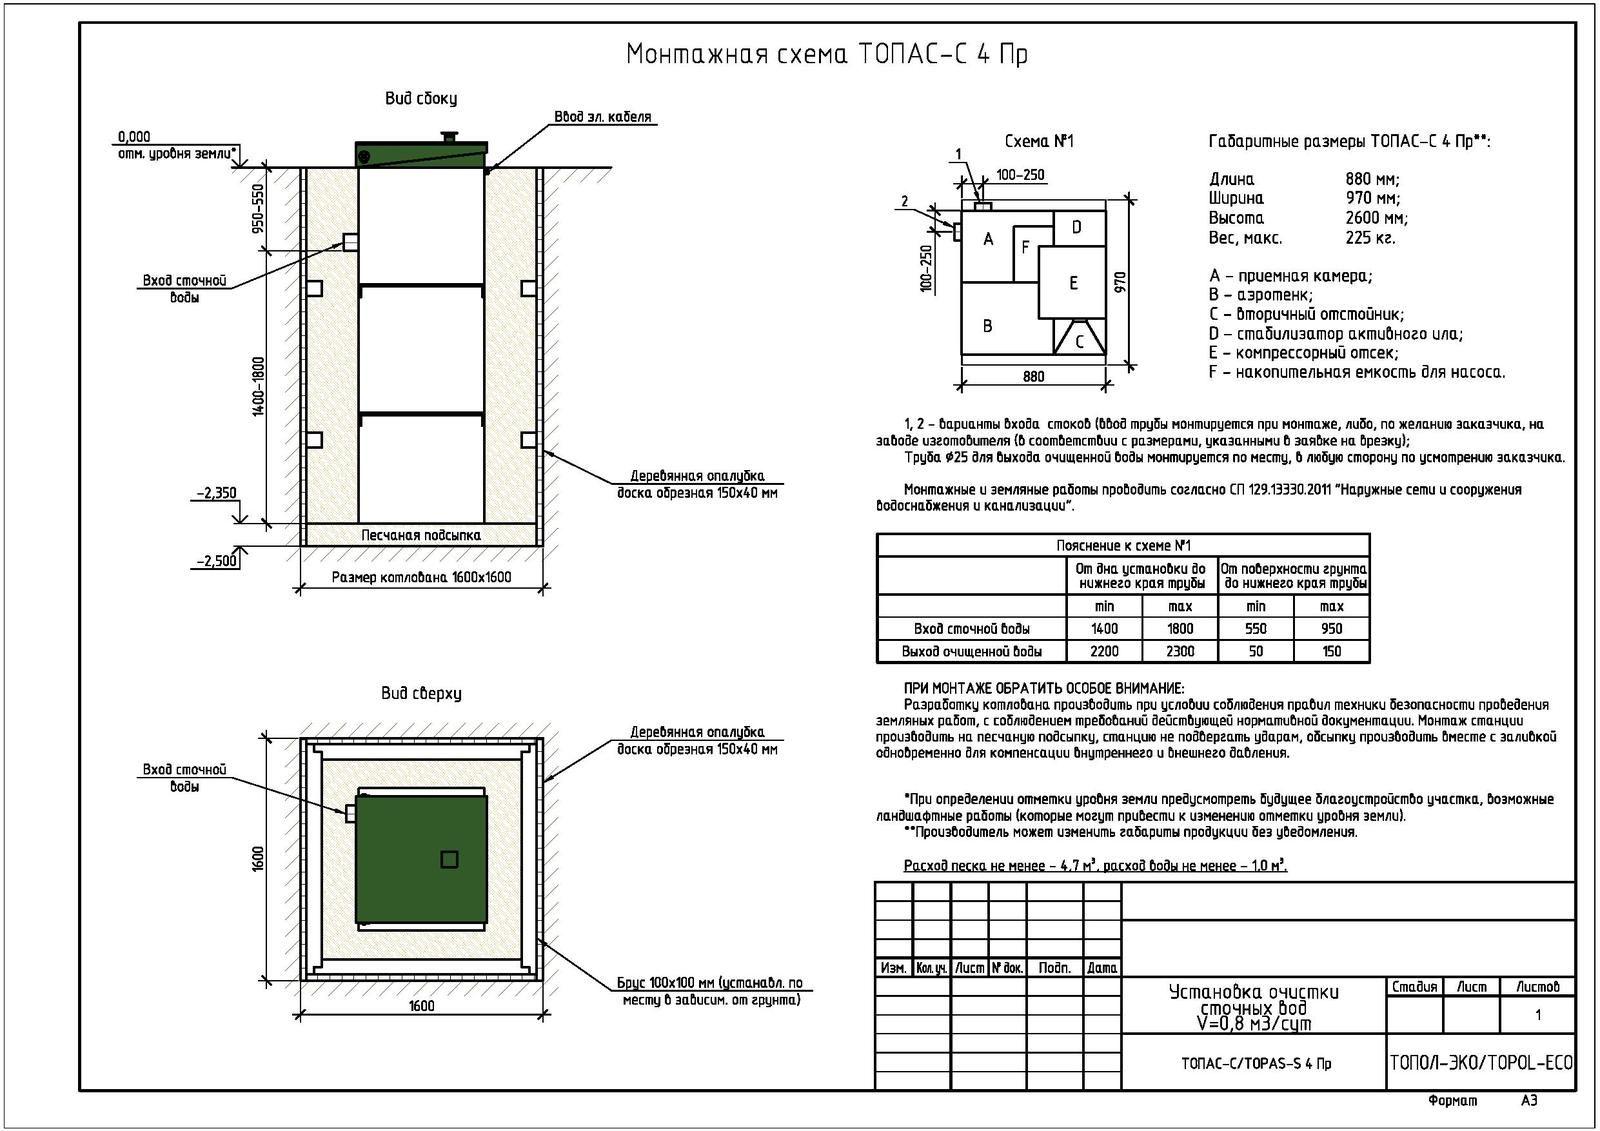 Монтажная схема септика Топас-С 4 ПР